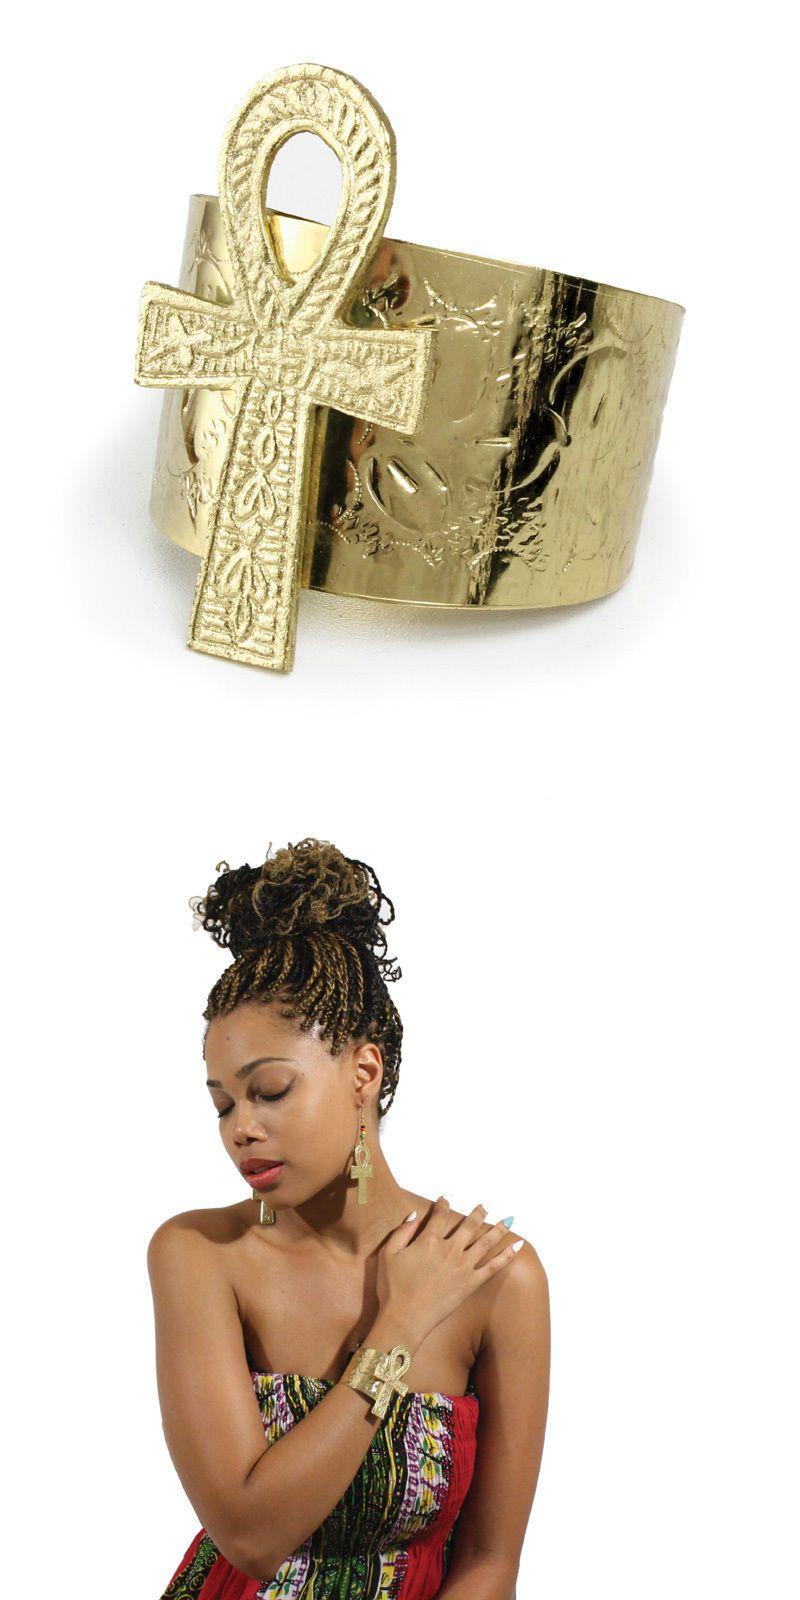 Jewelry ankh cuff ankh pendant anklets hand wrist bracelet cuff